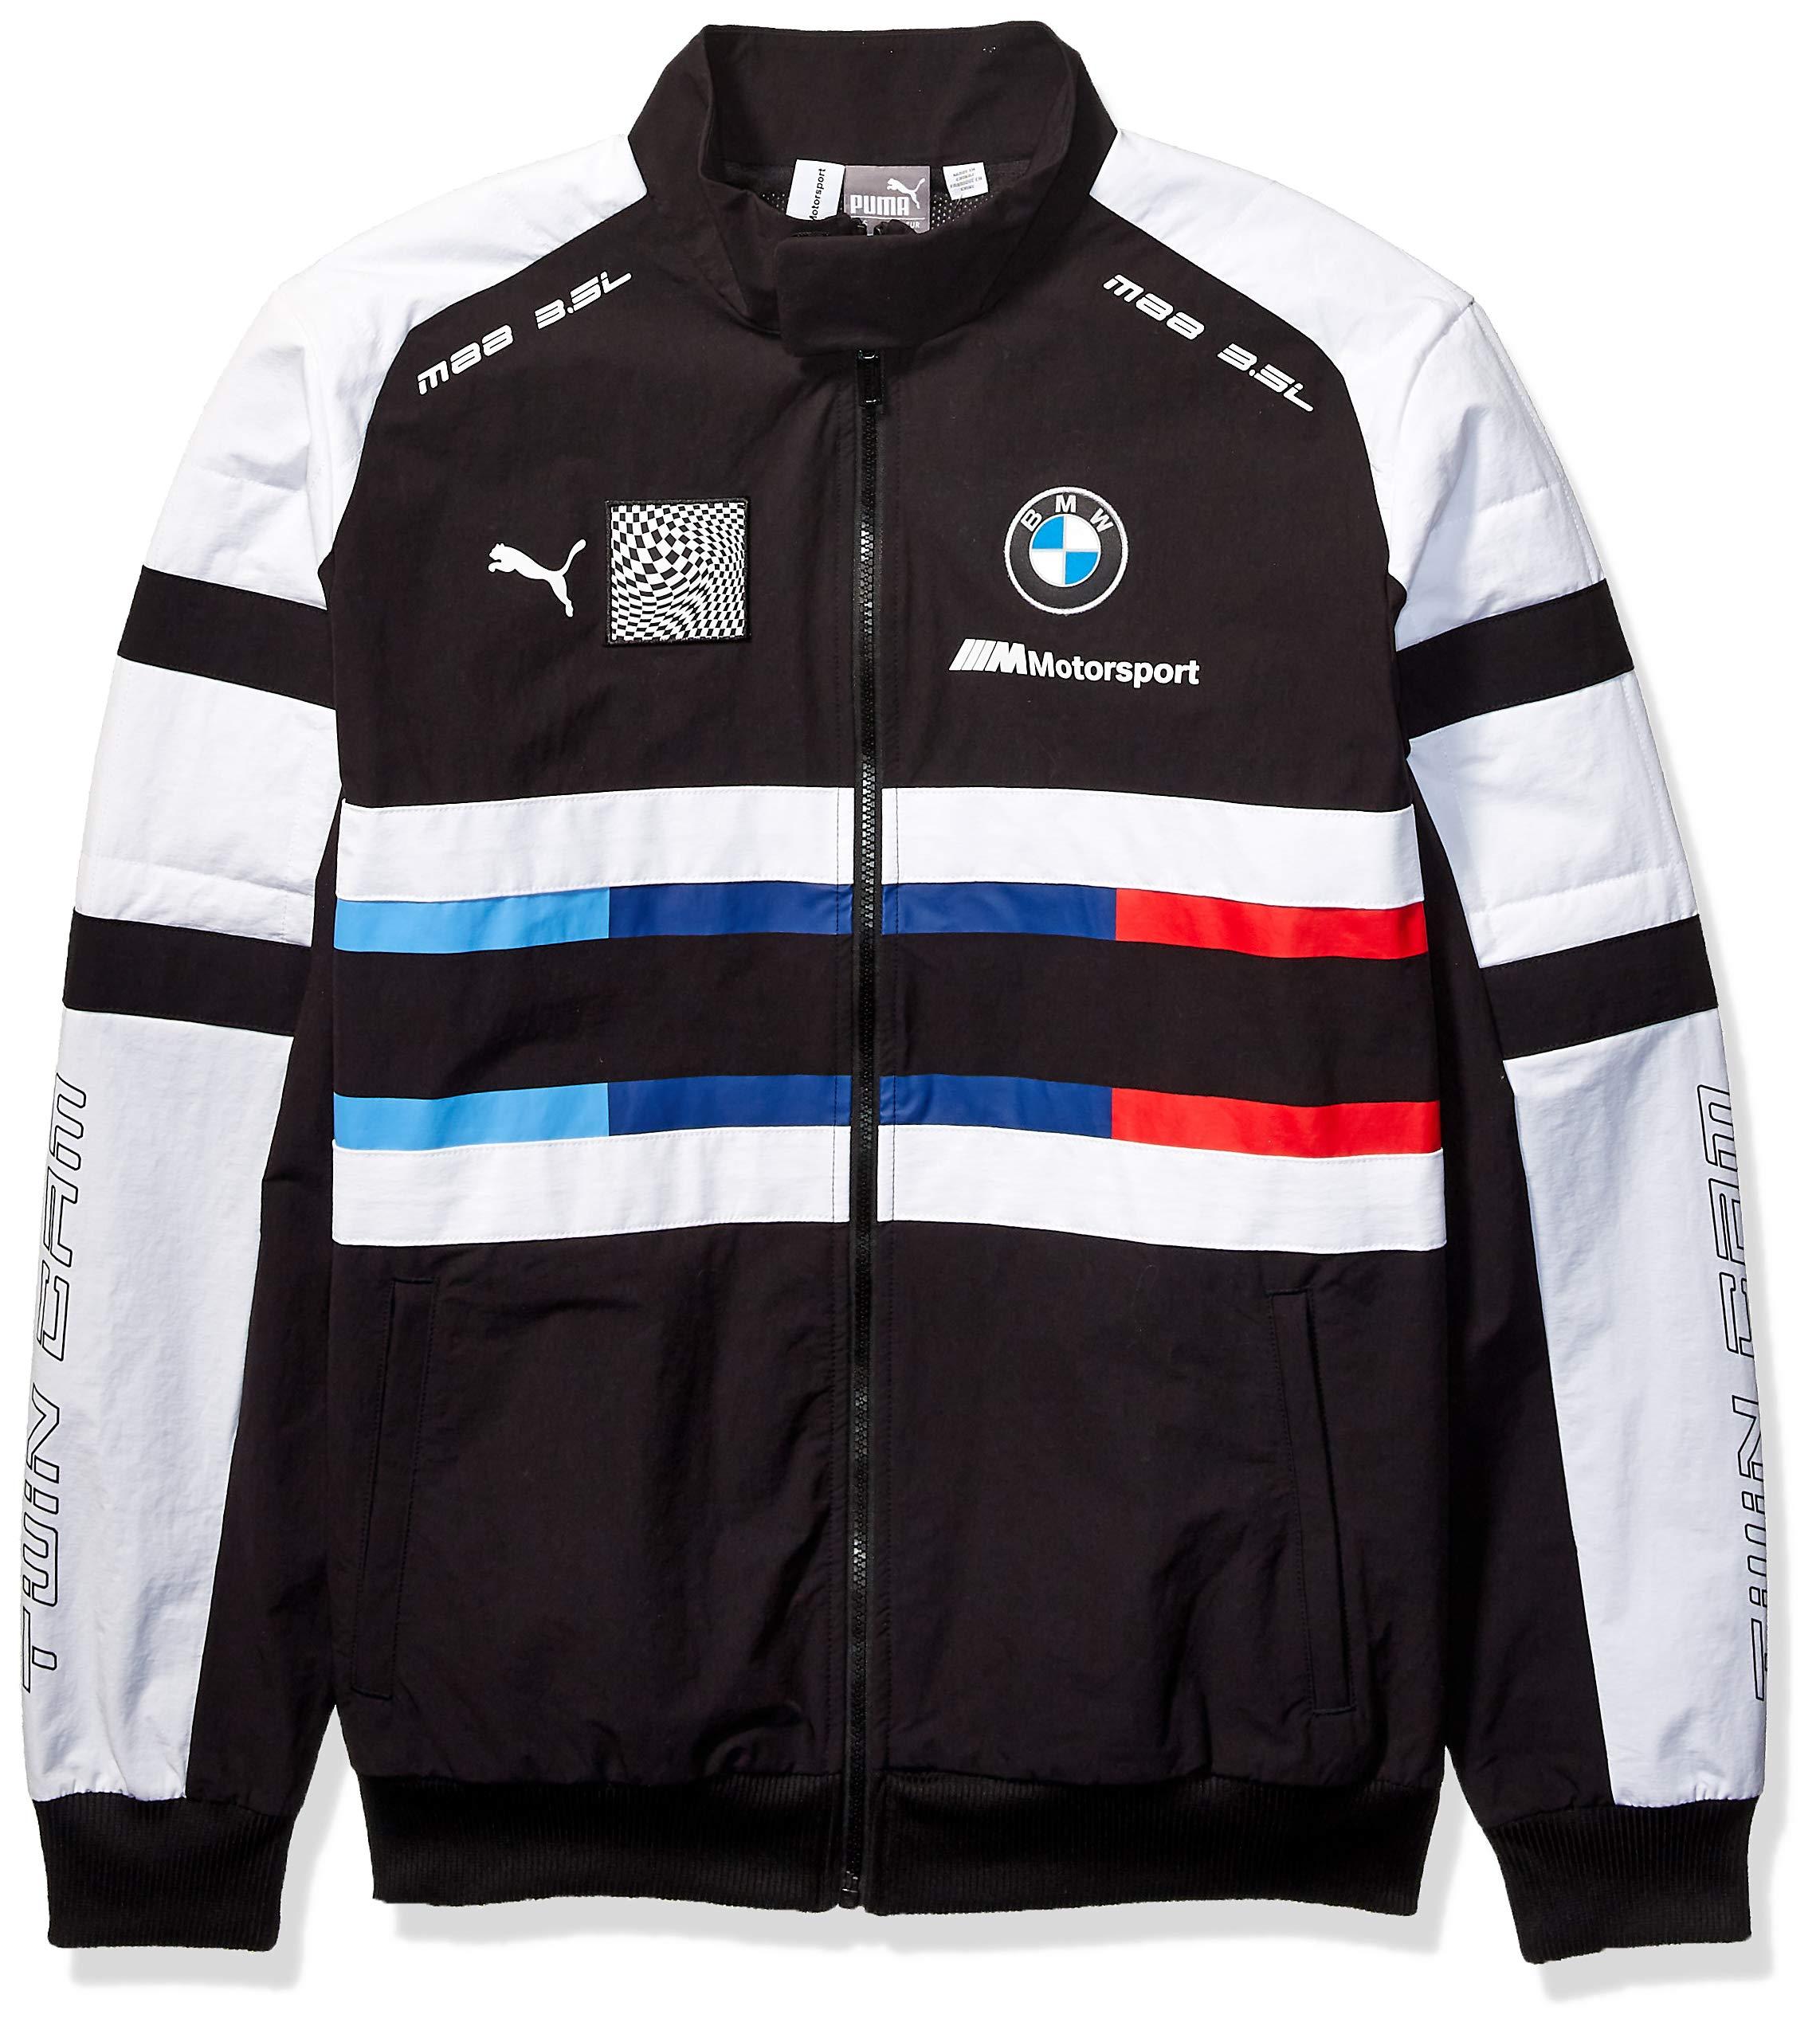 PUMA Men's BMW Motorsport Street Woven Jacket, Black, XX-Large by PUMA